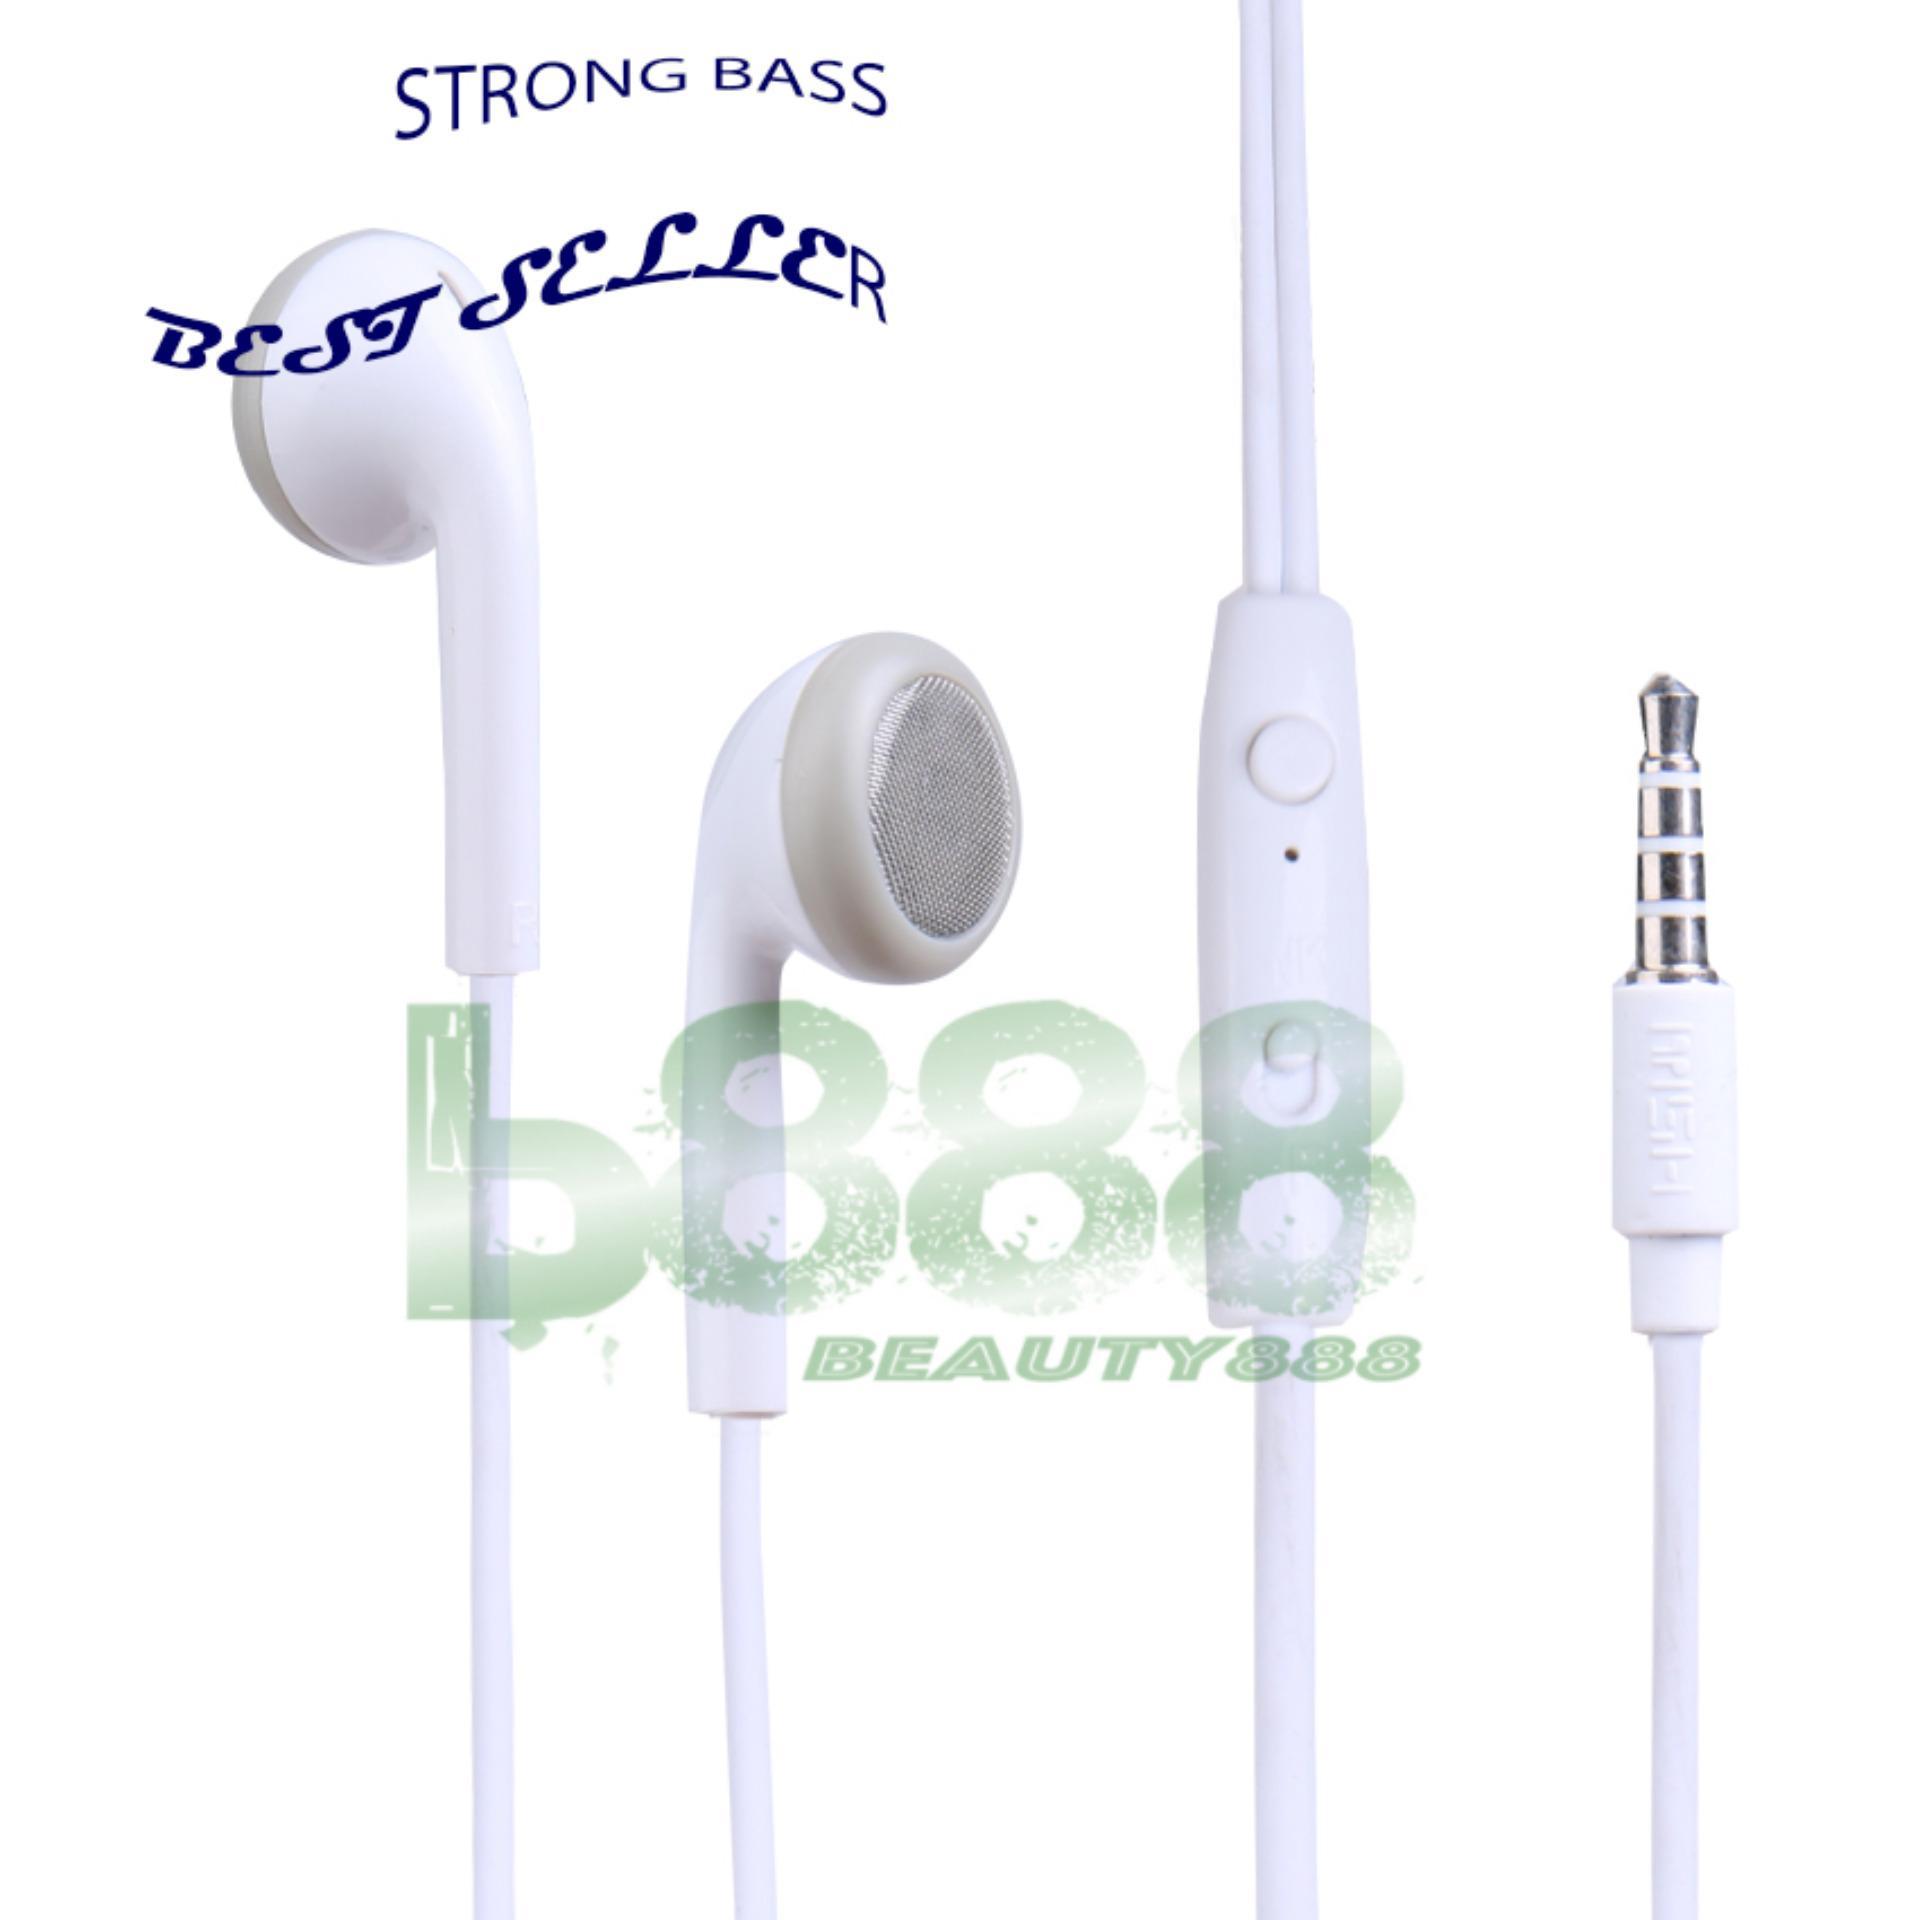 MSH Headset Stereo Mega Bass msh 205 earphone multi guna cocok sebagai earphone xiaomi oppo vivo